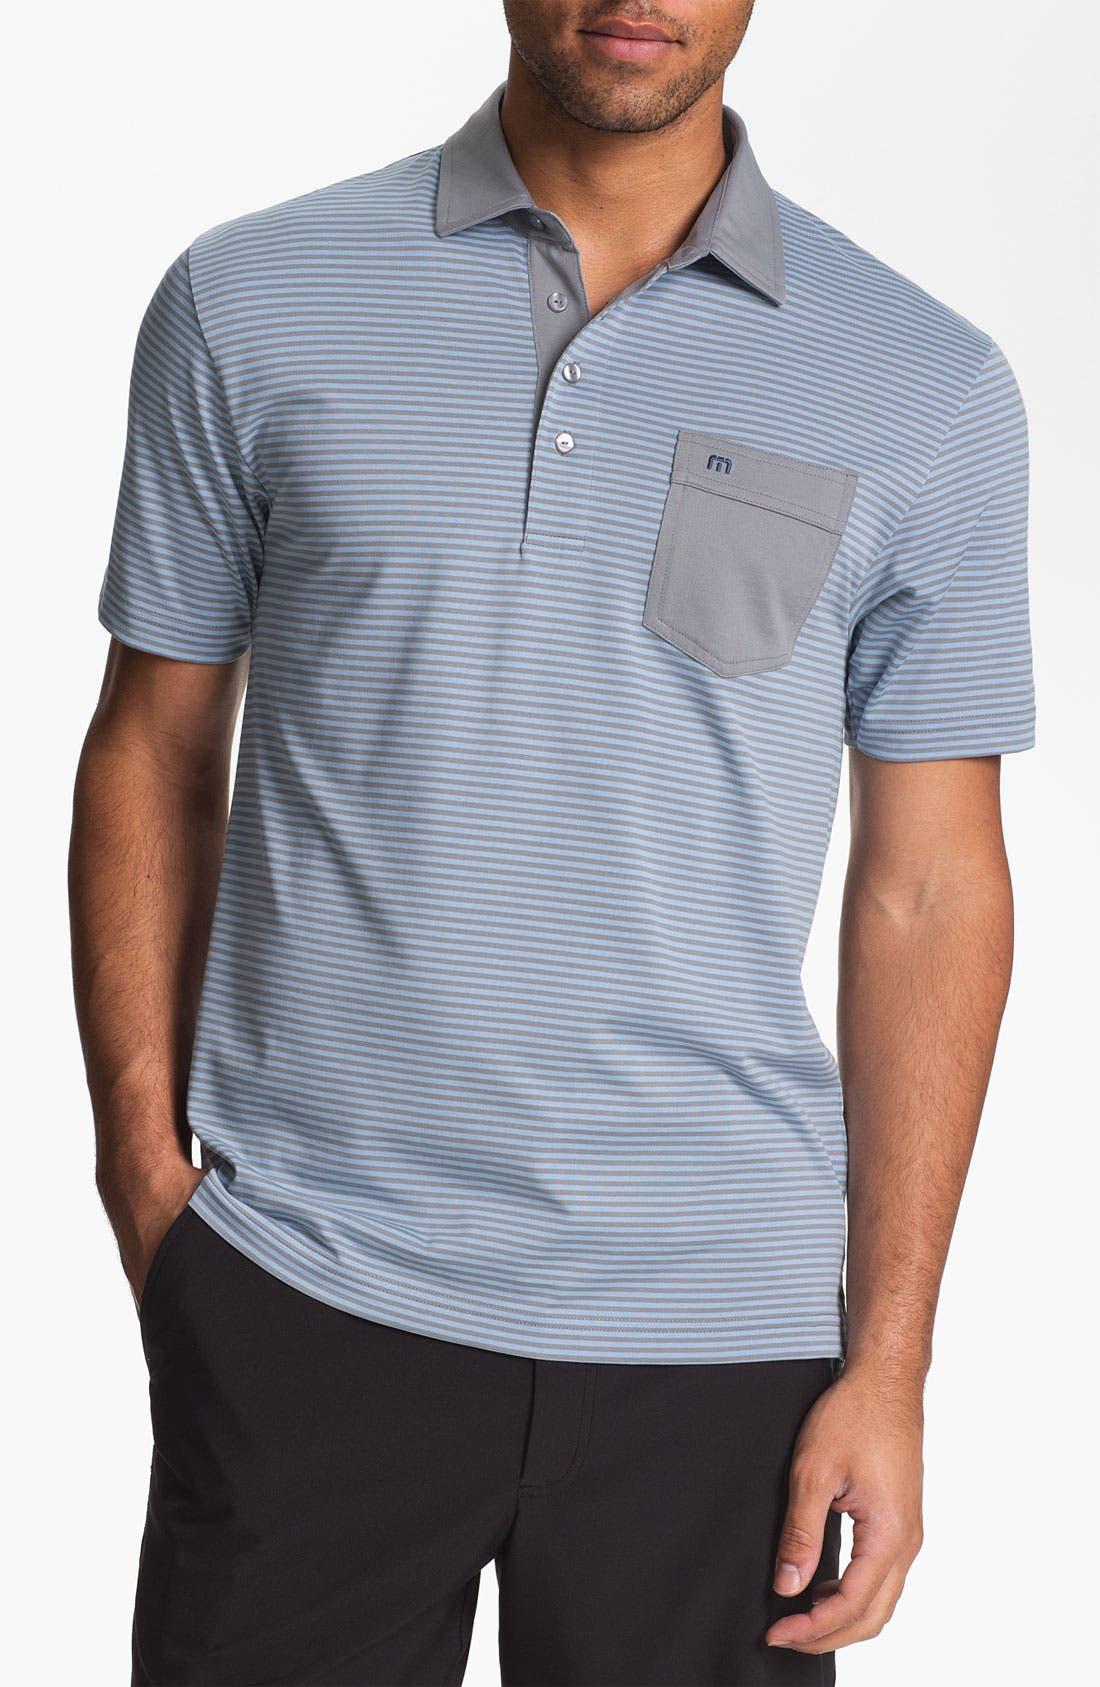 Main Image - Travis Mathew 'Mallinger' Regular Fit Golf Polo